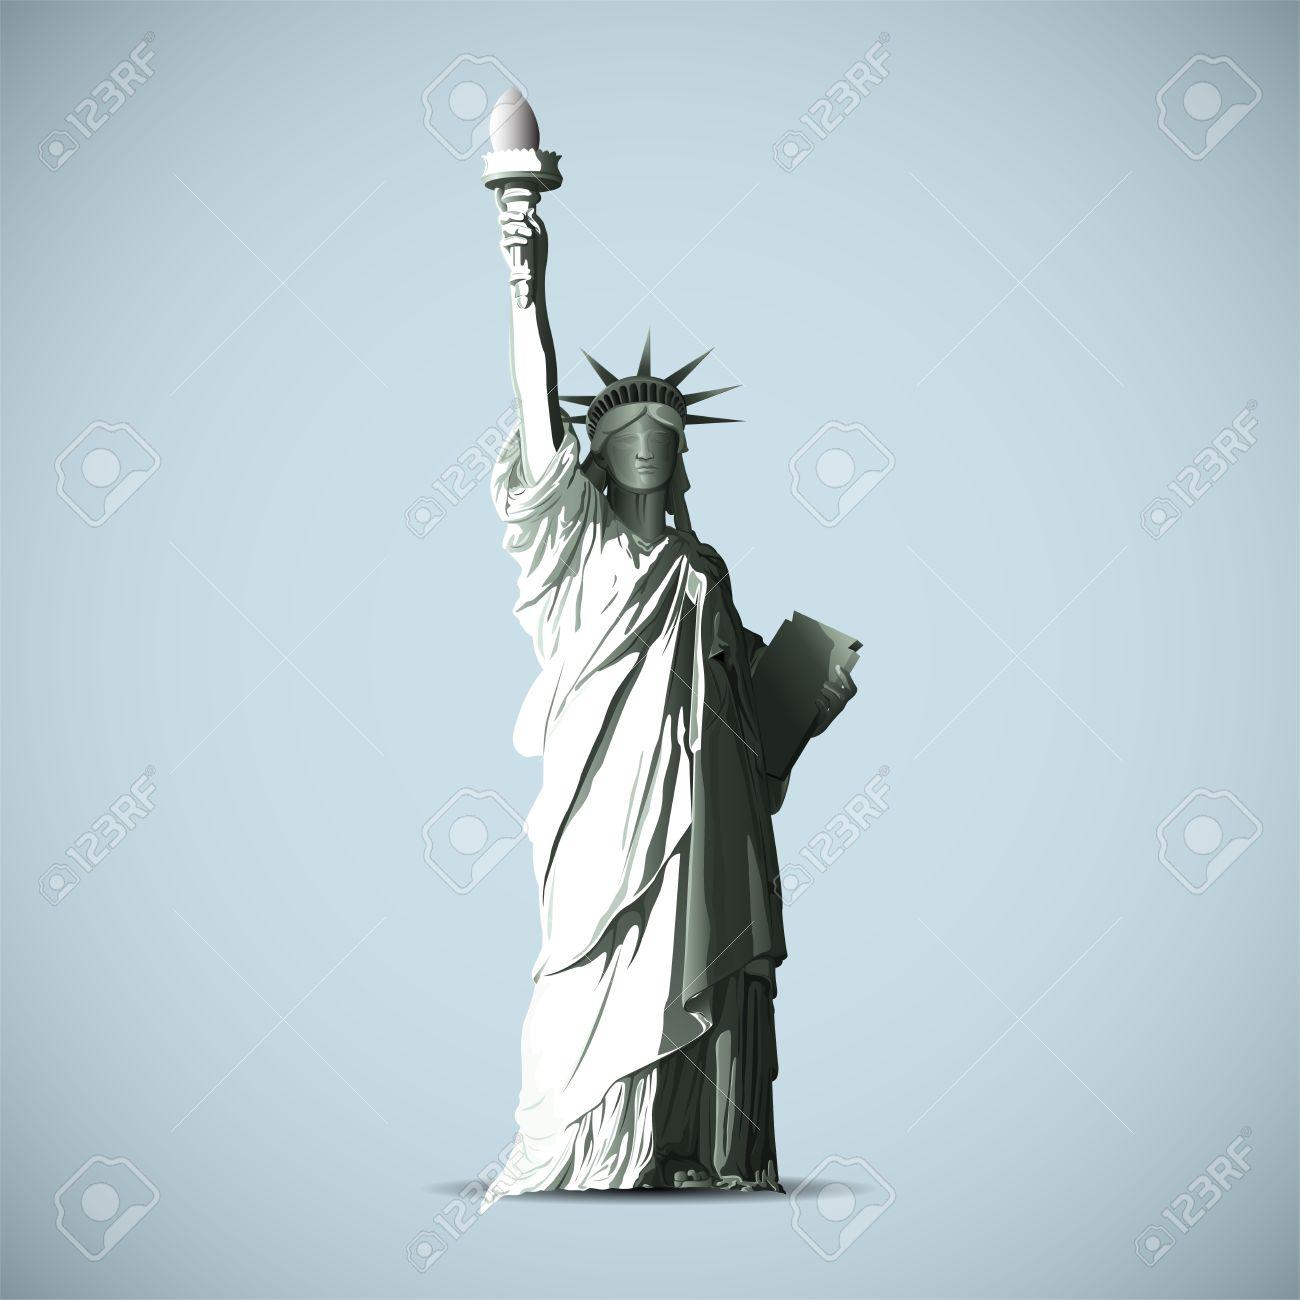 Statue Of Liberty Vector Black Shadows Silhouette Stock Vector - 15140158